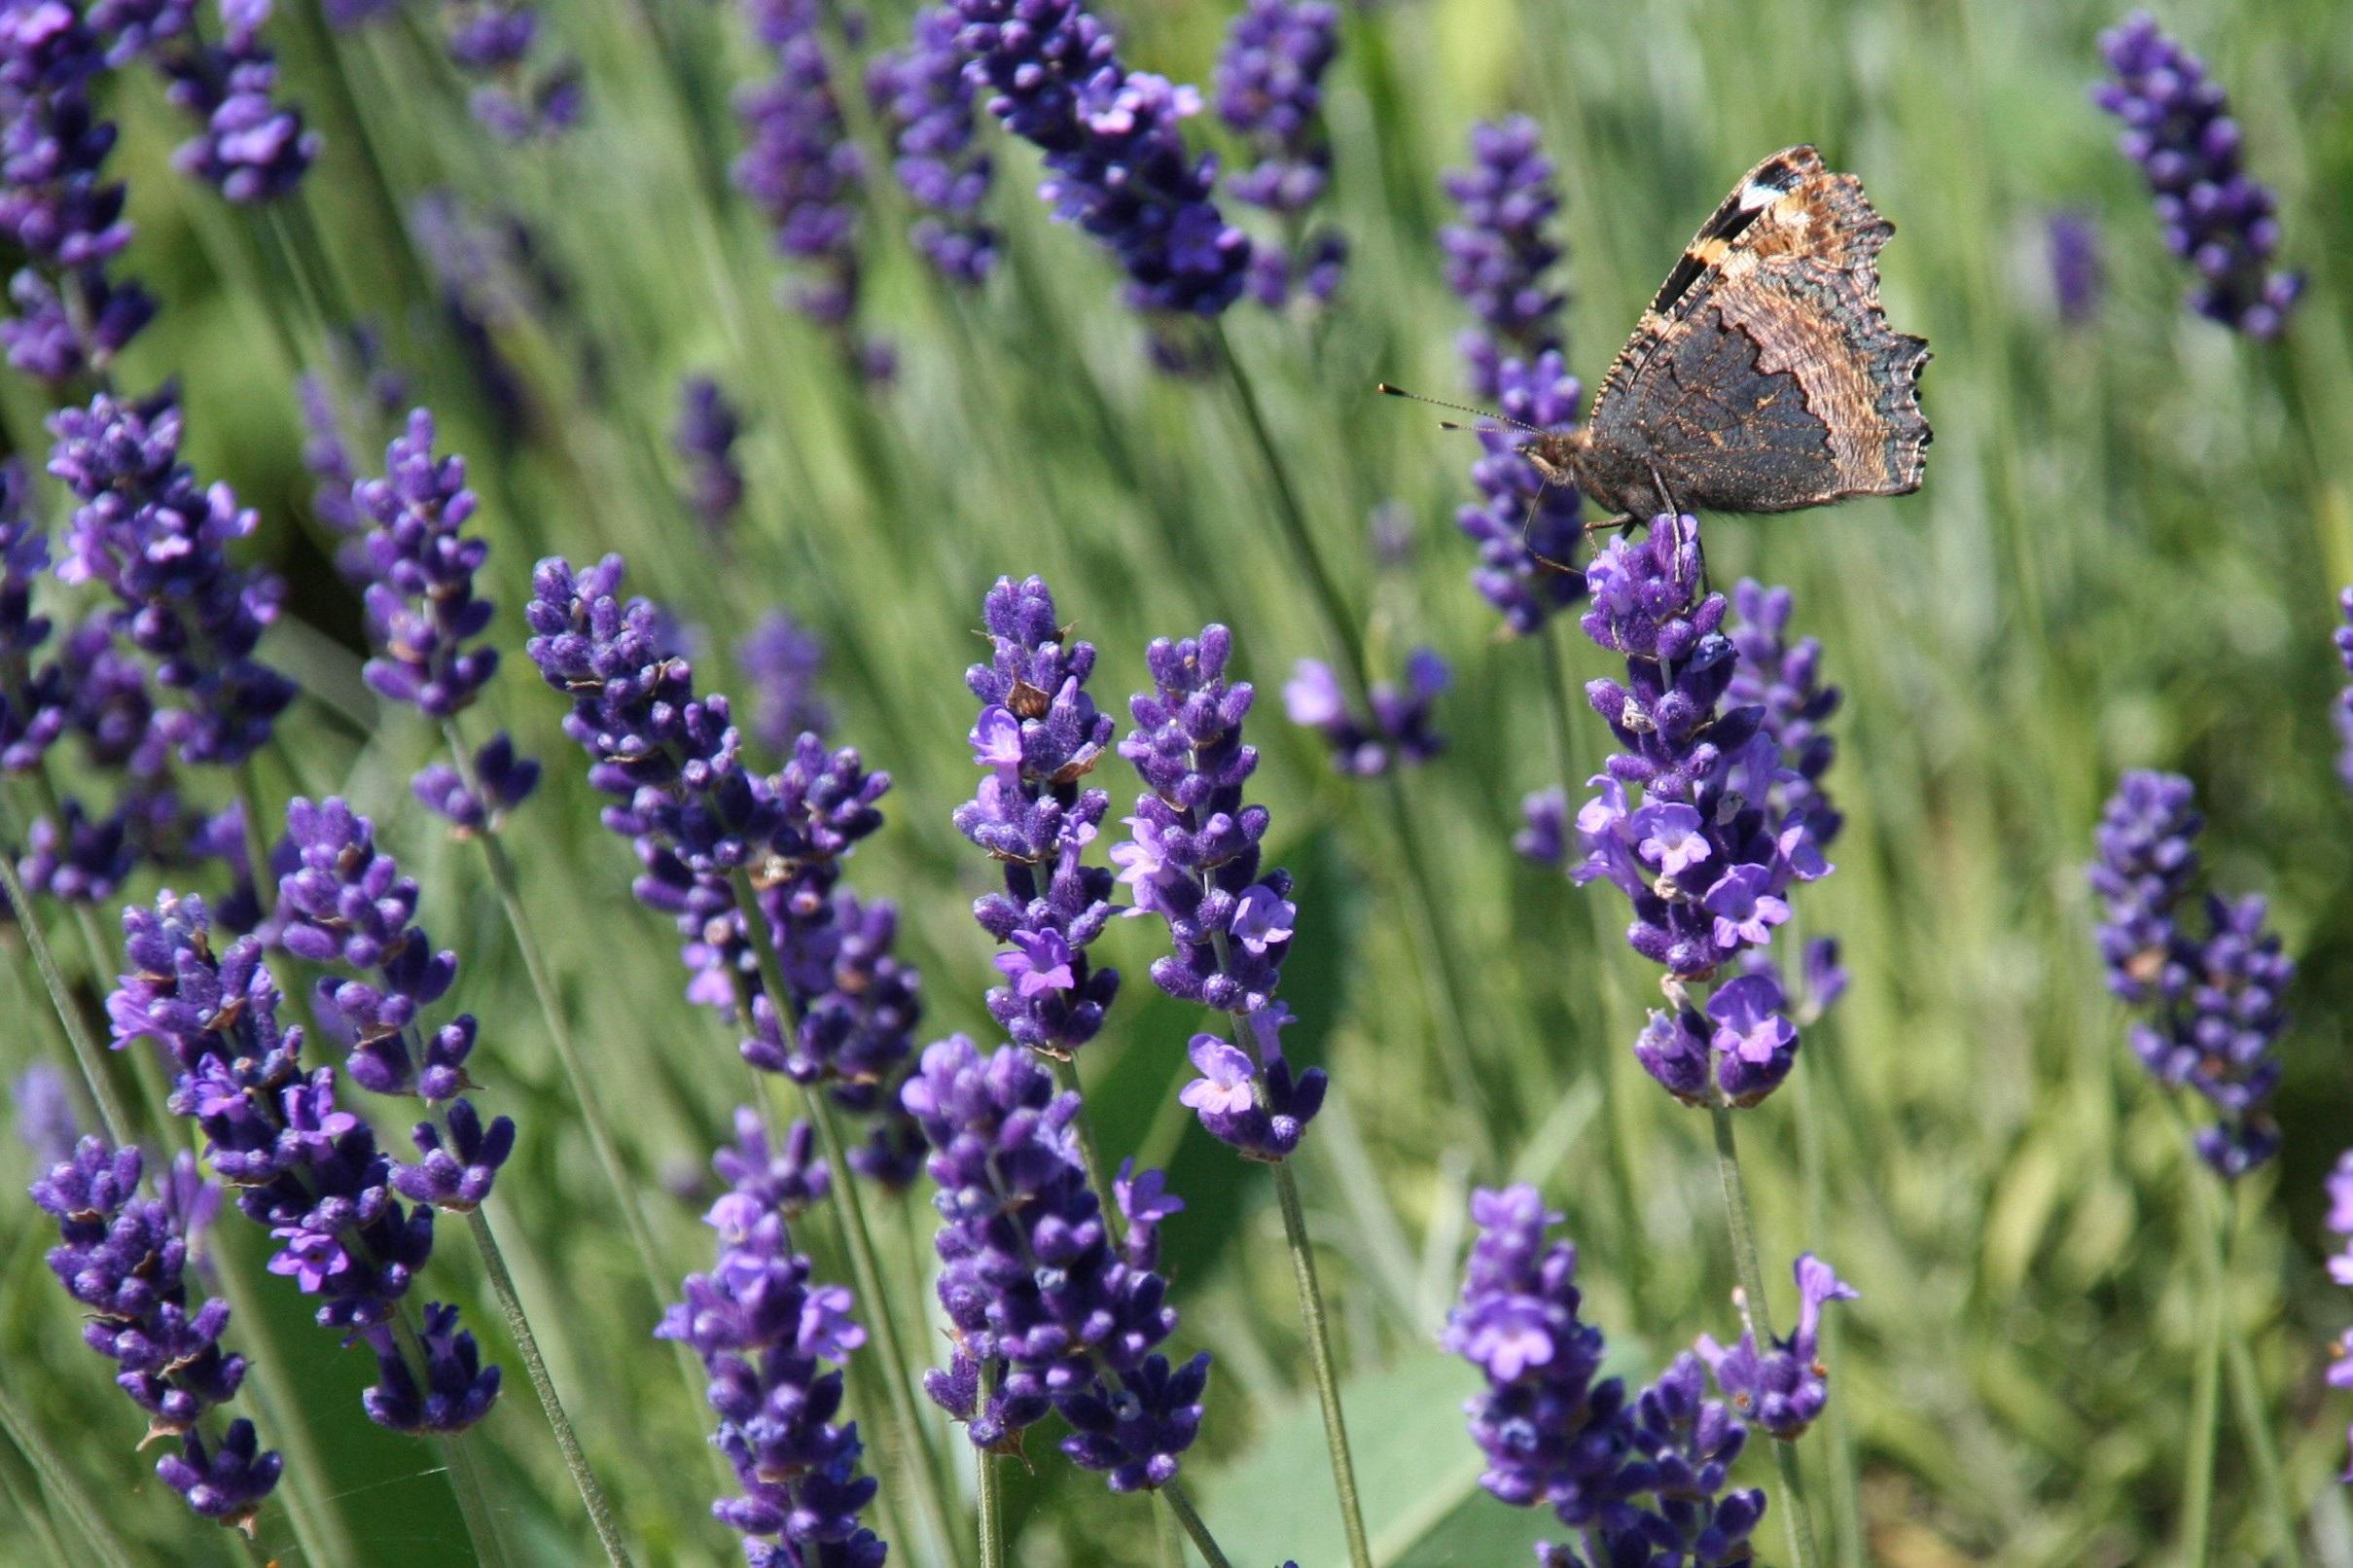 Images Gratuites : la nature, Prairie, herbe, insecte ...